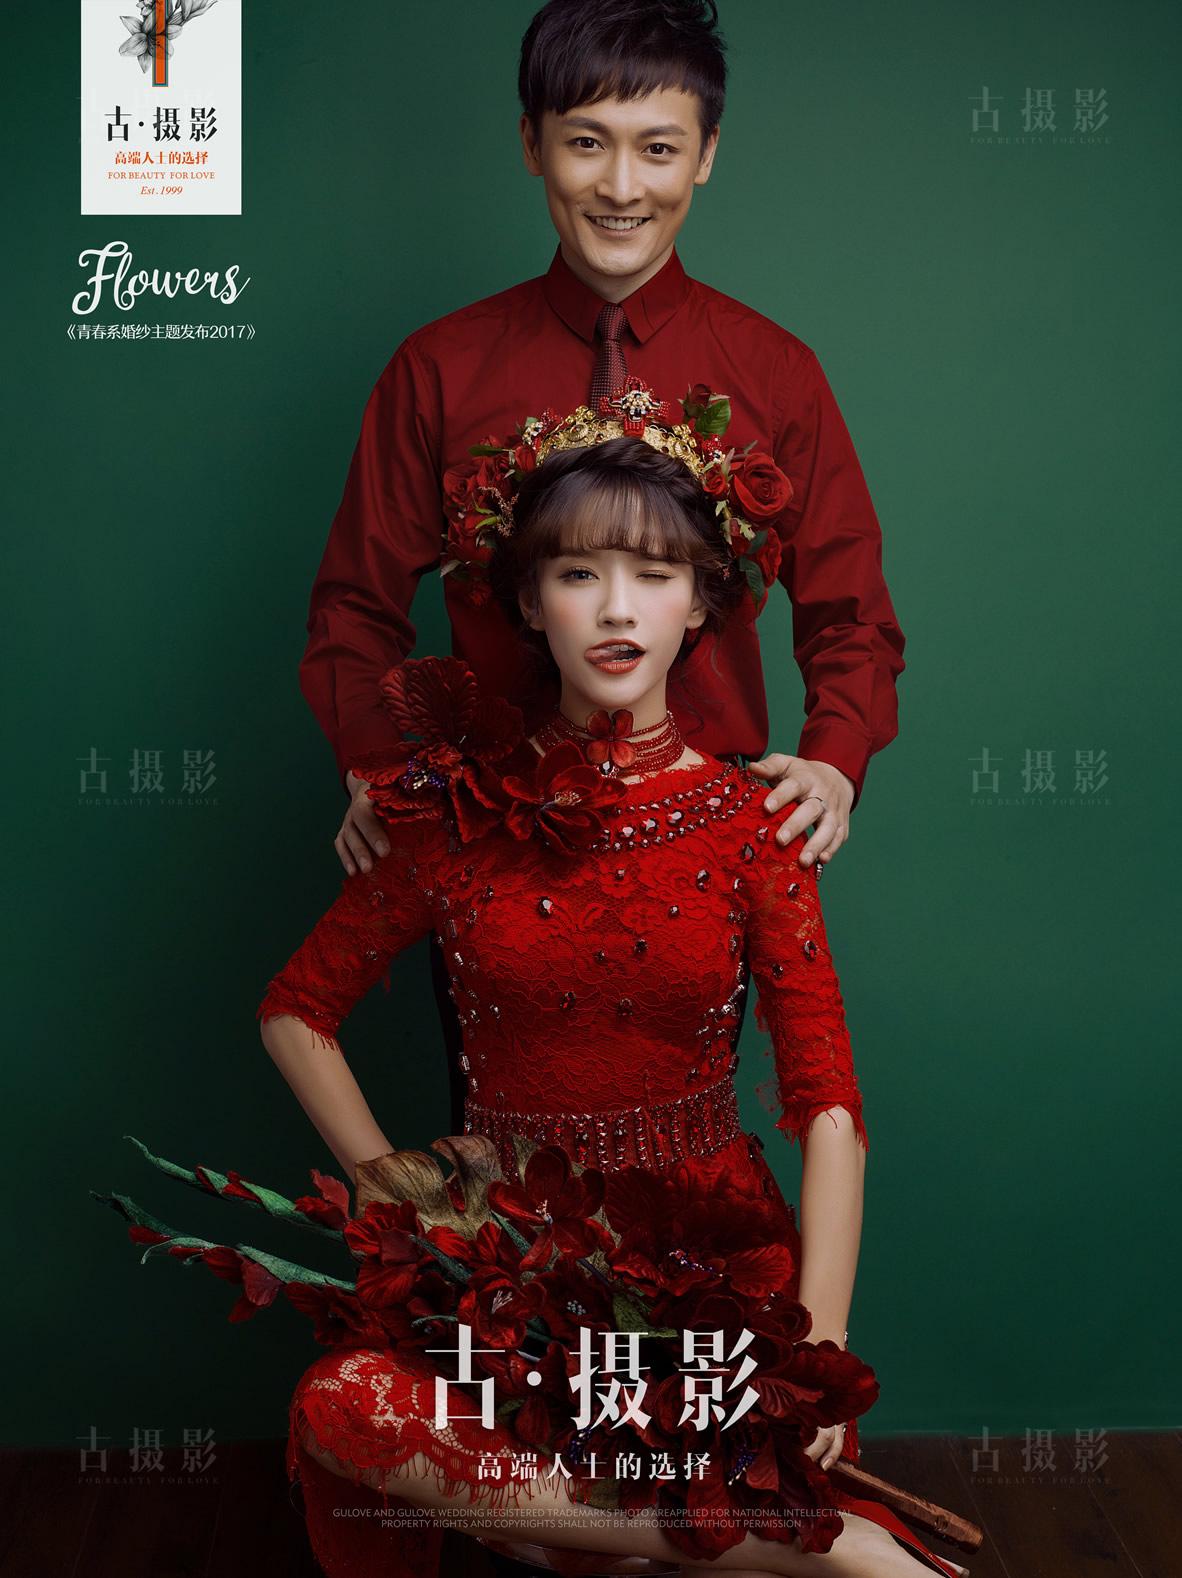 Flowers Red - 明星范 - 广州婚纱摄影-广州古摄影官网